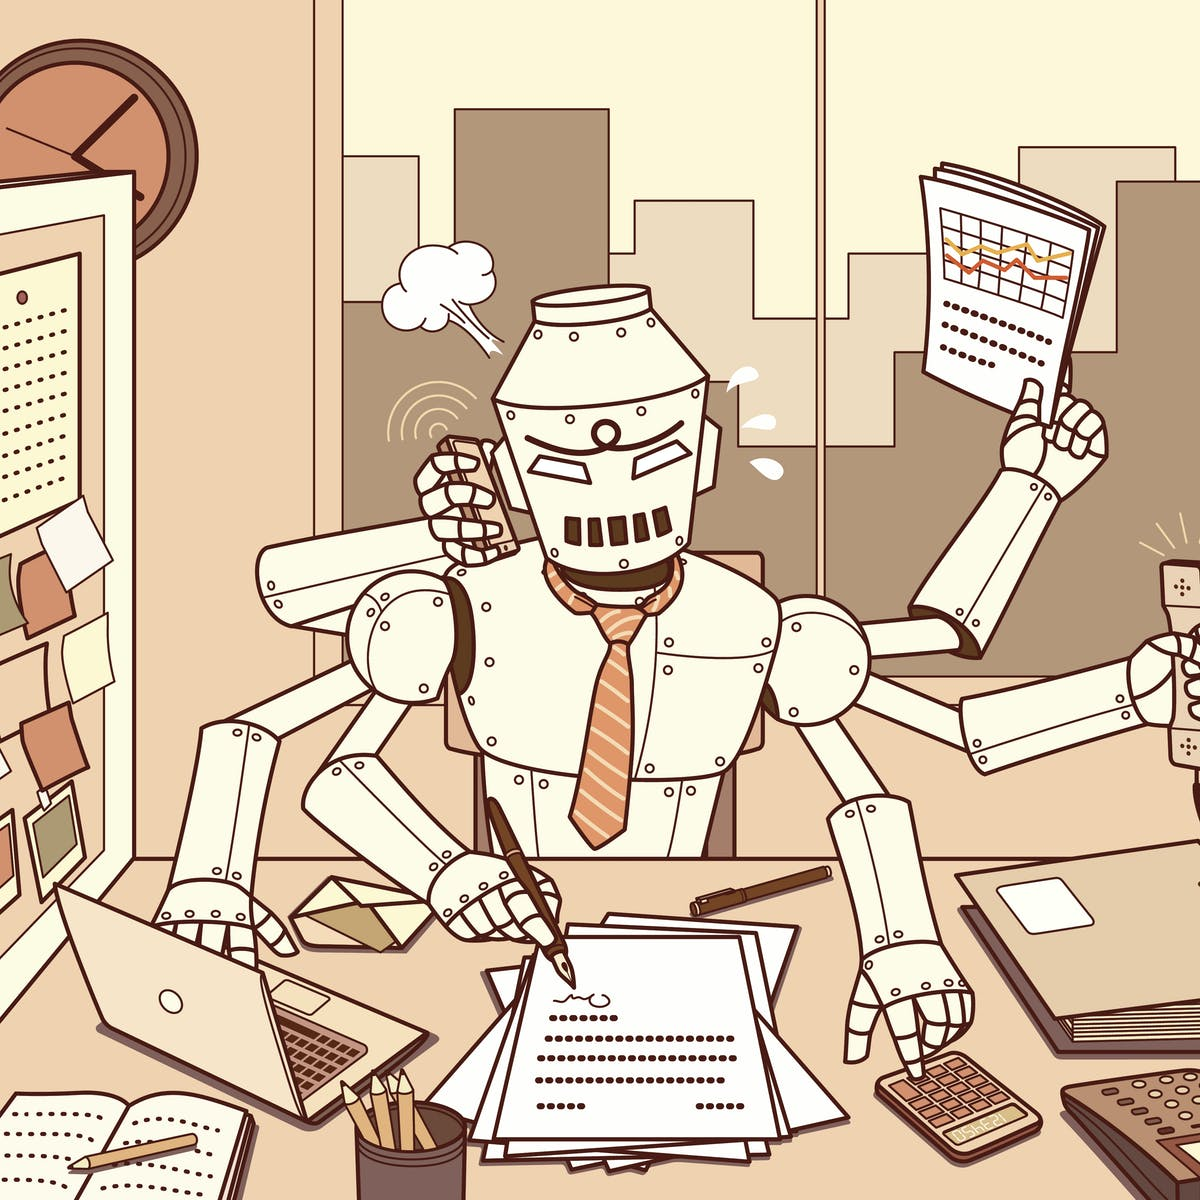 Human-like machines and machine-like humans are the future of A.I.